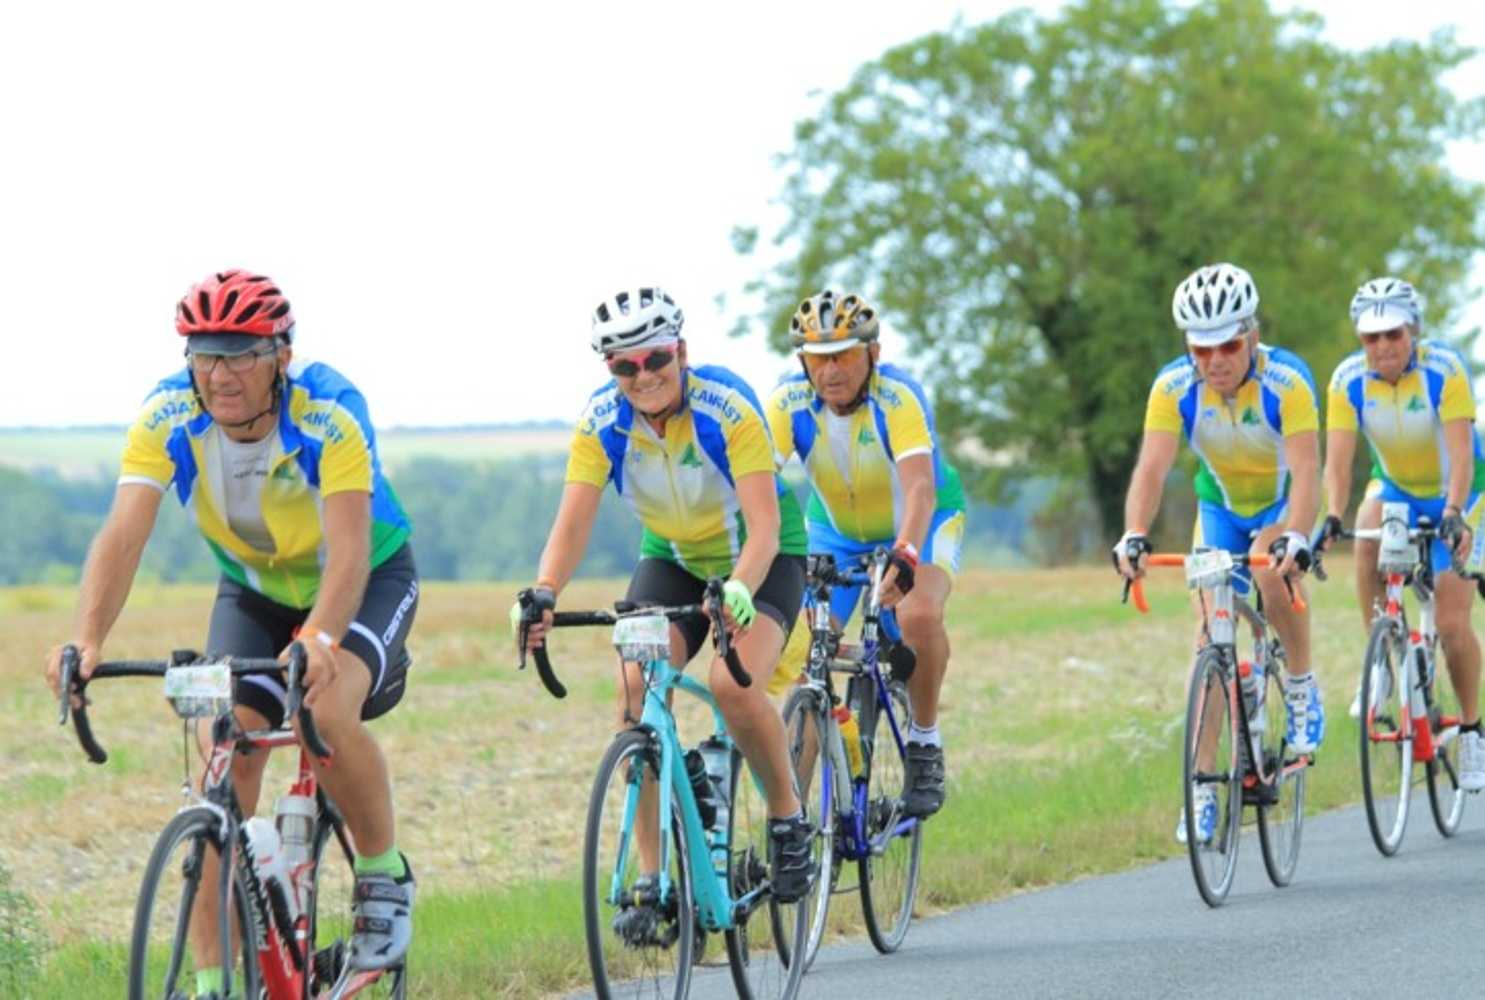 Club Cyclotouriste Langastien 0